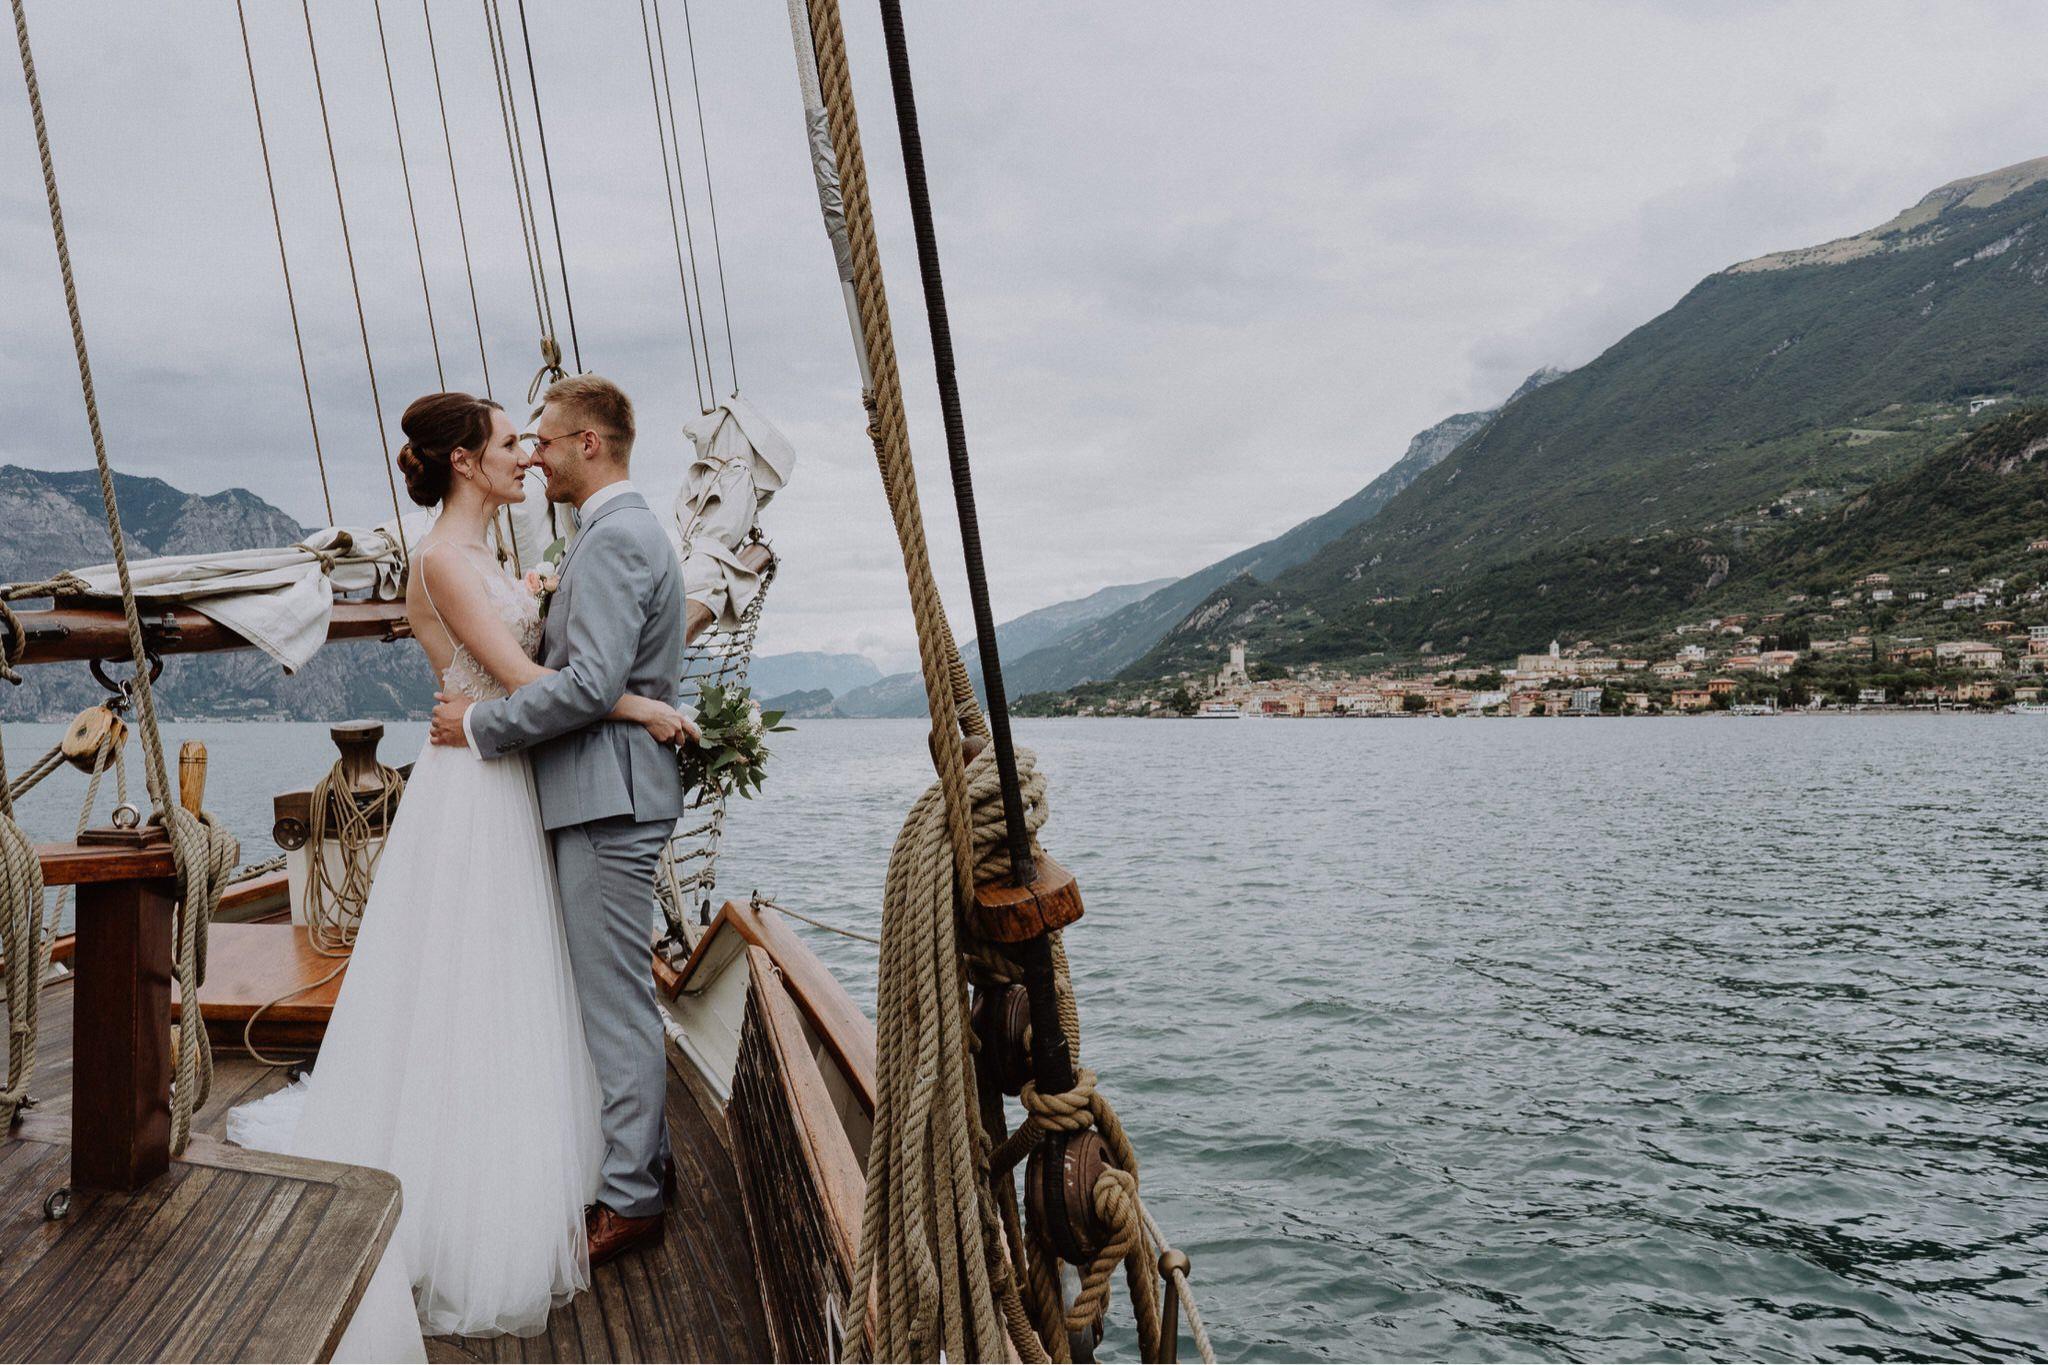 28 la 02 bootsfahrt 1196 weddinphotographer Hochzeitsfotograf newzealand hamilton Weddingphotography Stuttgart